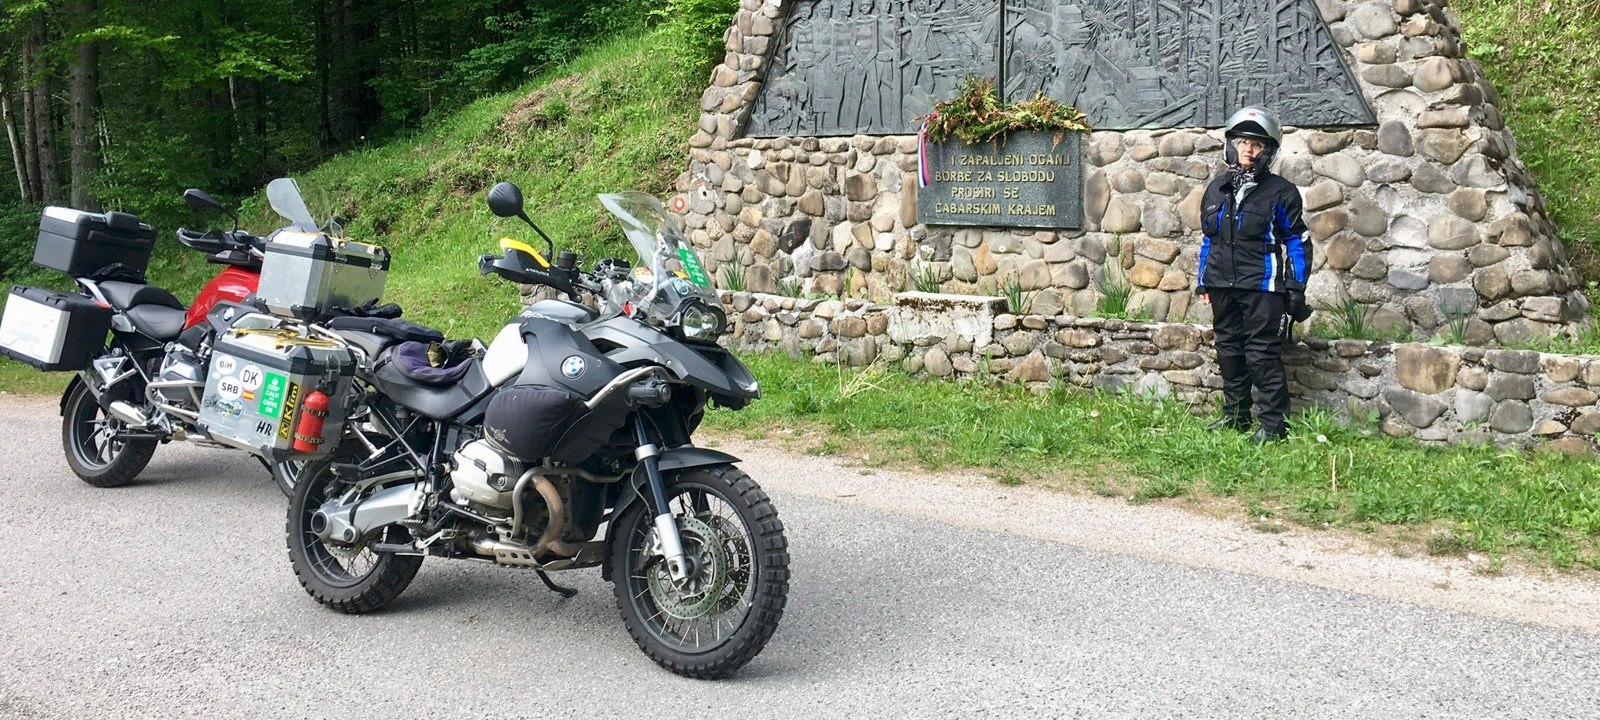 Wold War II Partisan memorial, Backroad Motorcycle Adventure